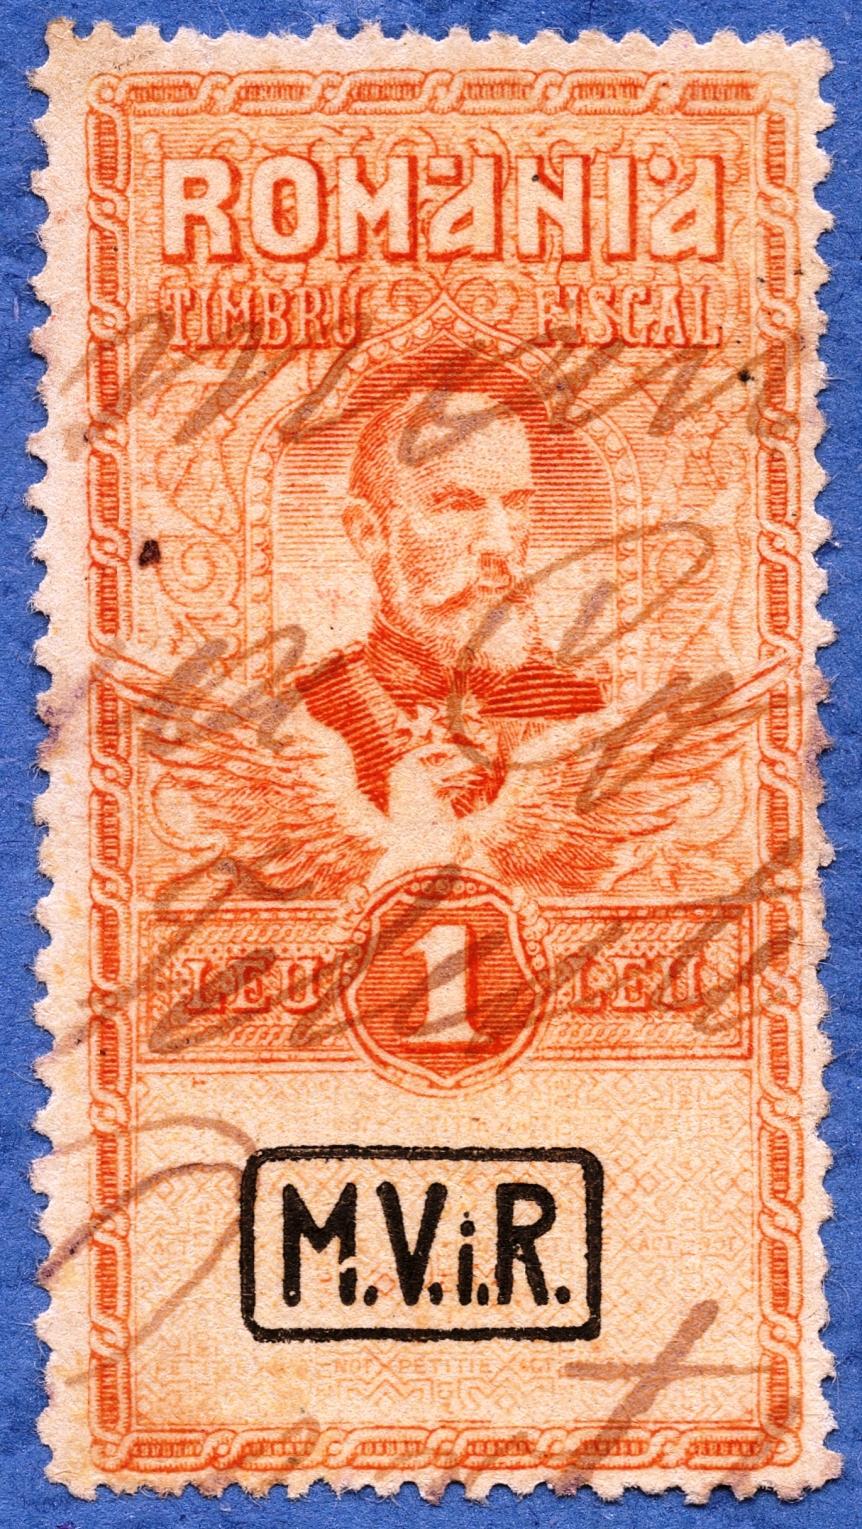 1917 supratipar MVIR pe 1 LEU FISCAL